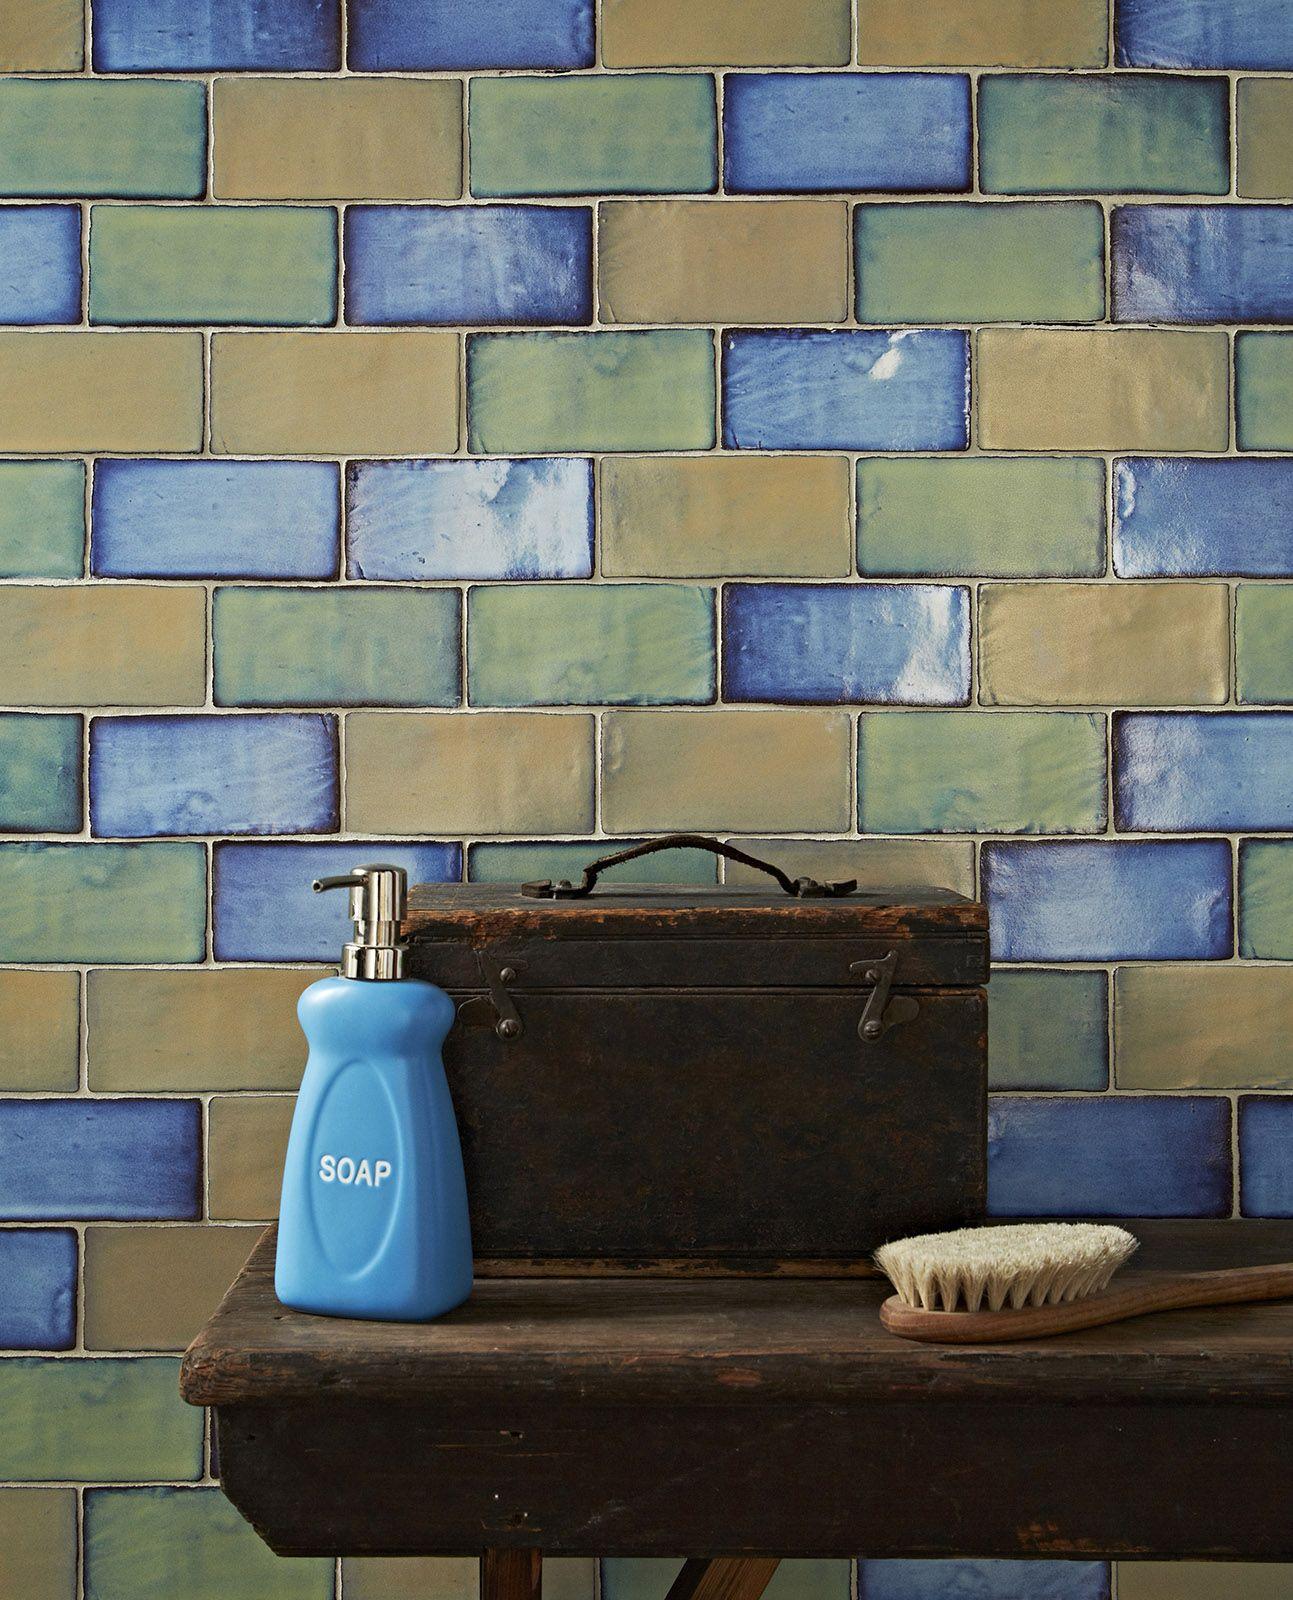 Amazing Colourful Iridescent Backsplash Kitchen Or Bathroom Tiles